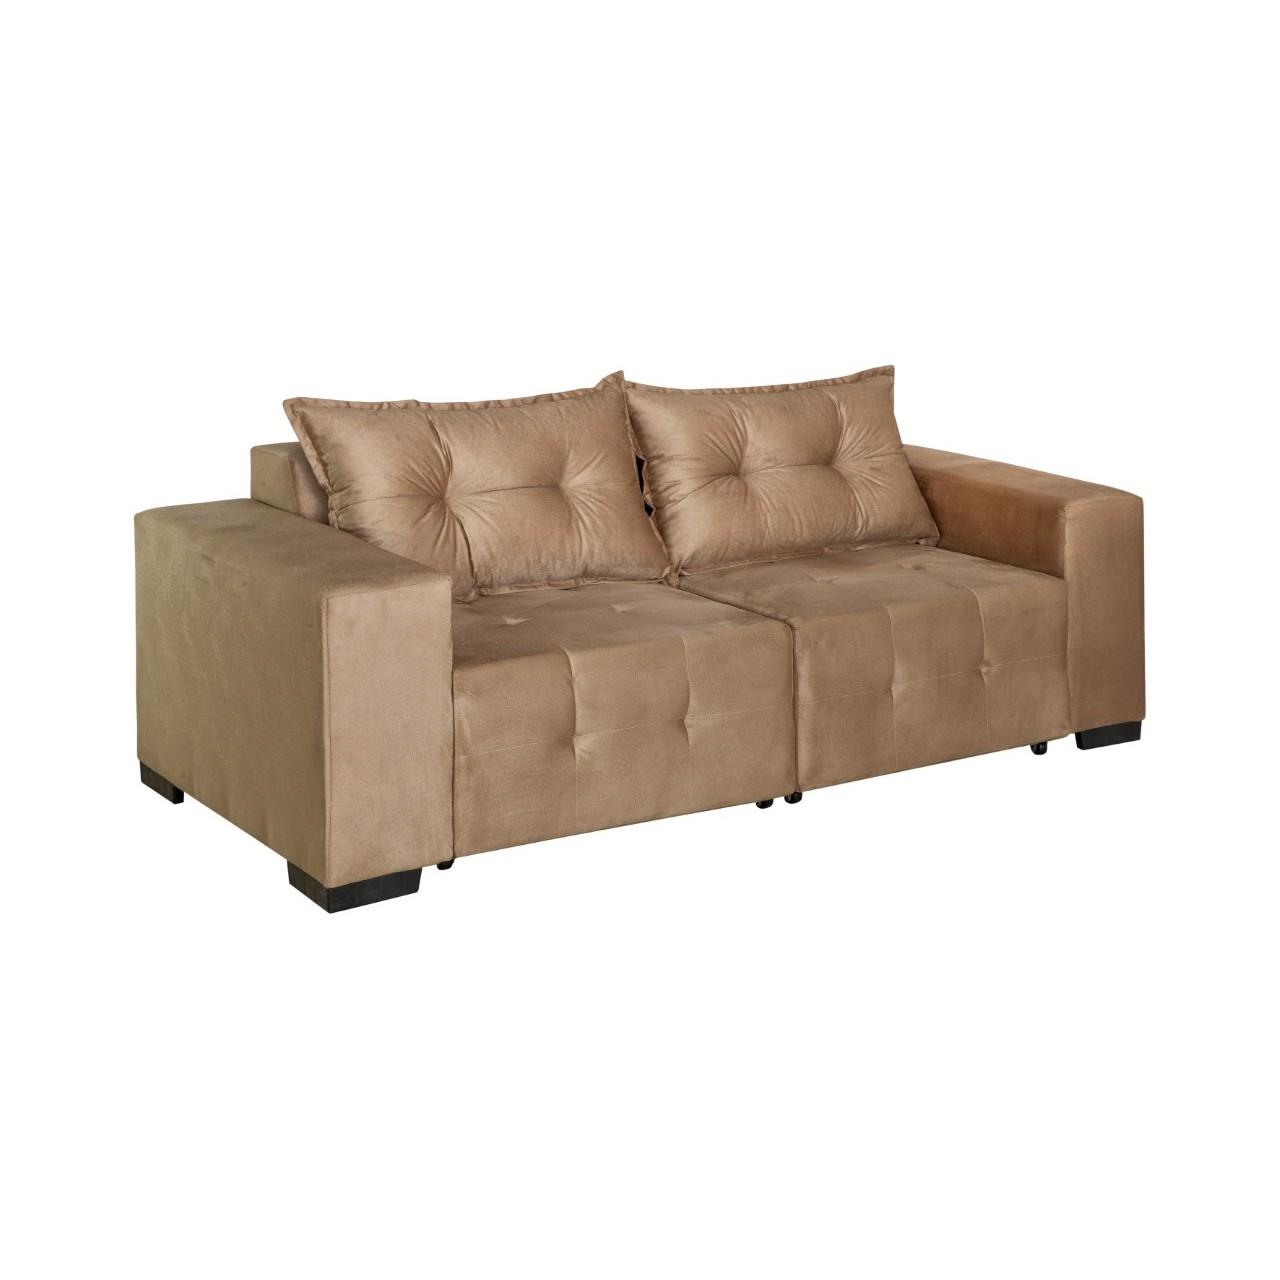 Sofa Bulgaria 3 Lugares Retratil Veludo Bege - Design Colchoes